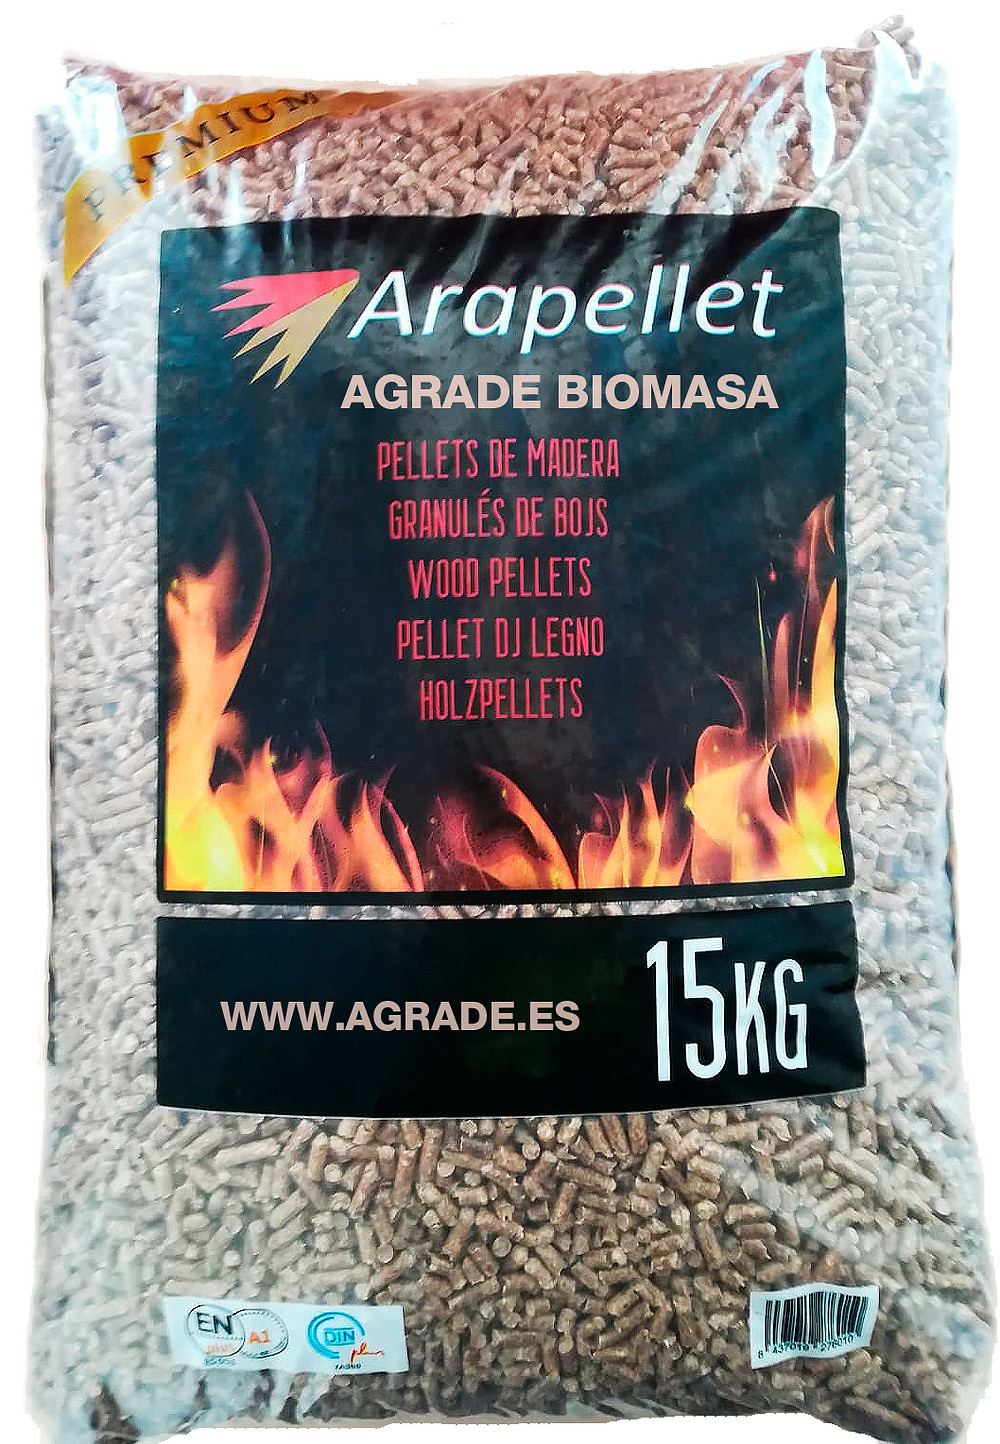 Pellet Arapellet en Agrade Biomasa